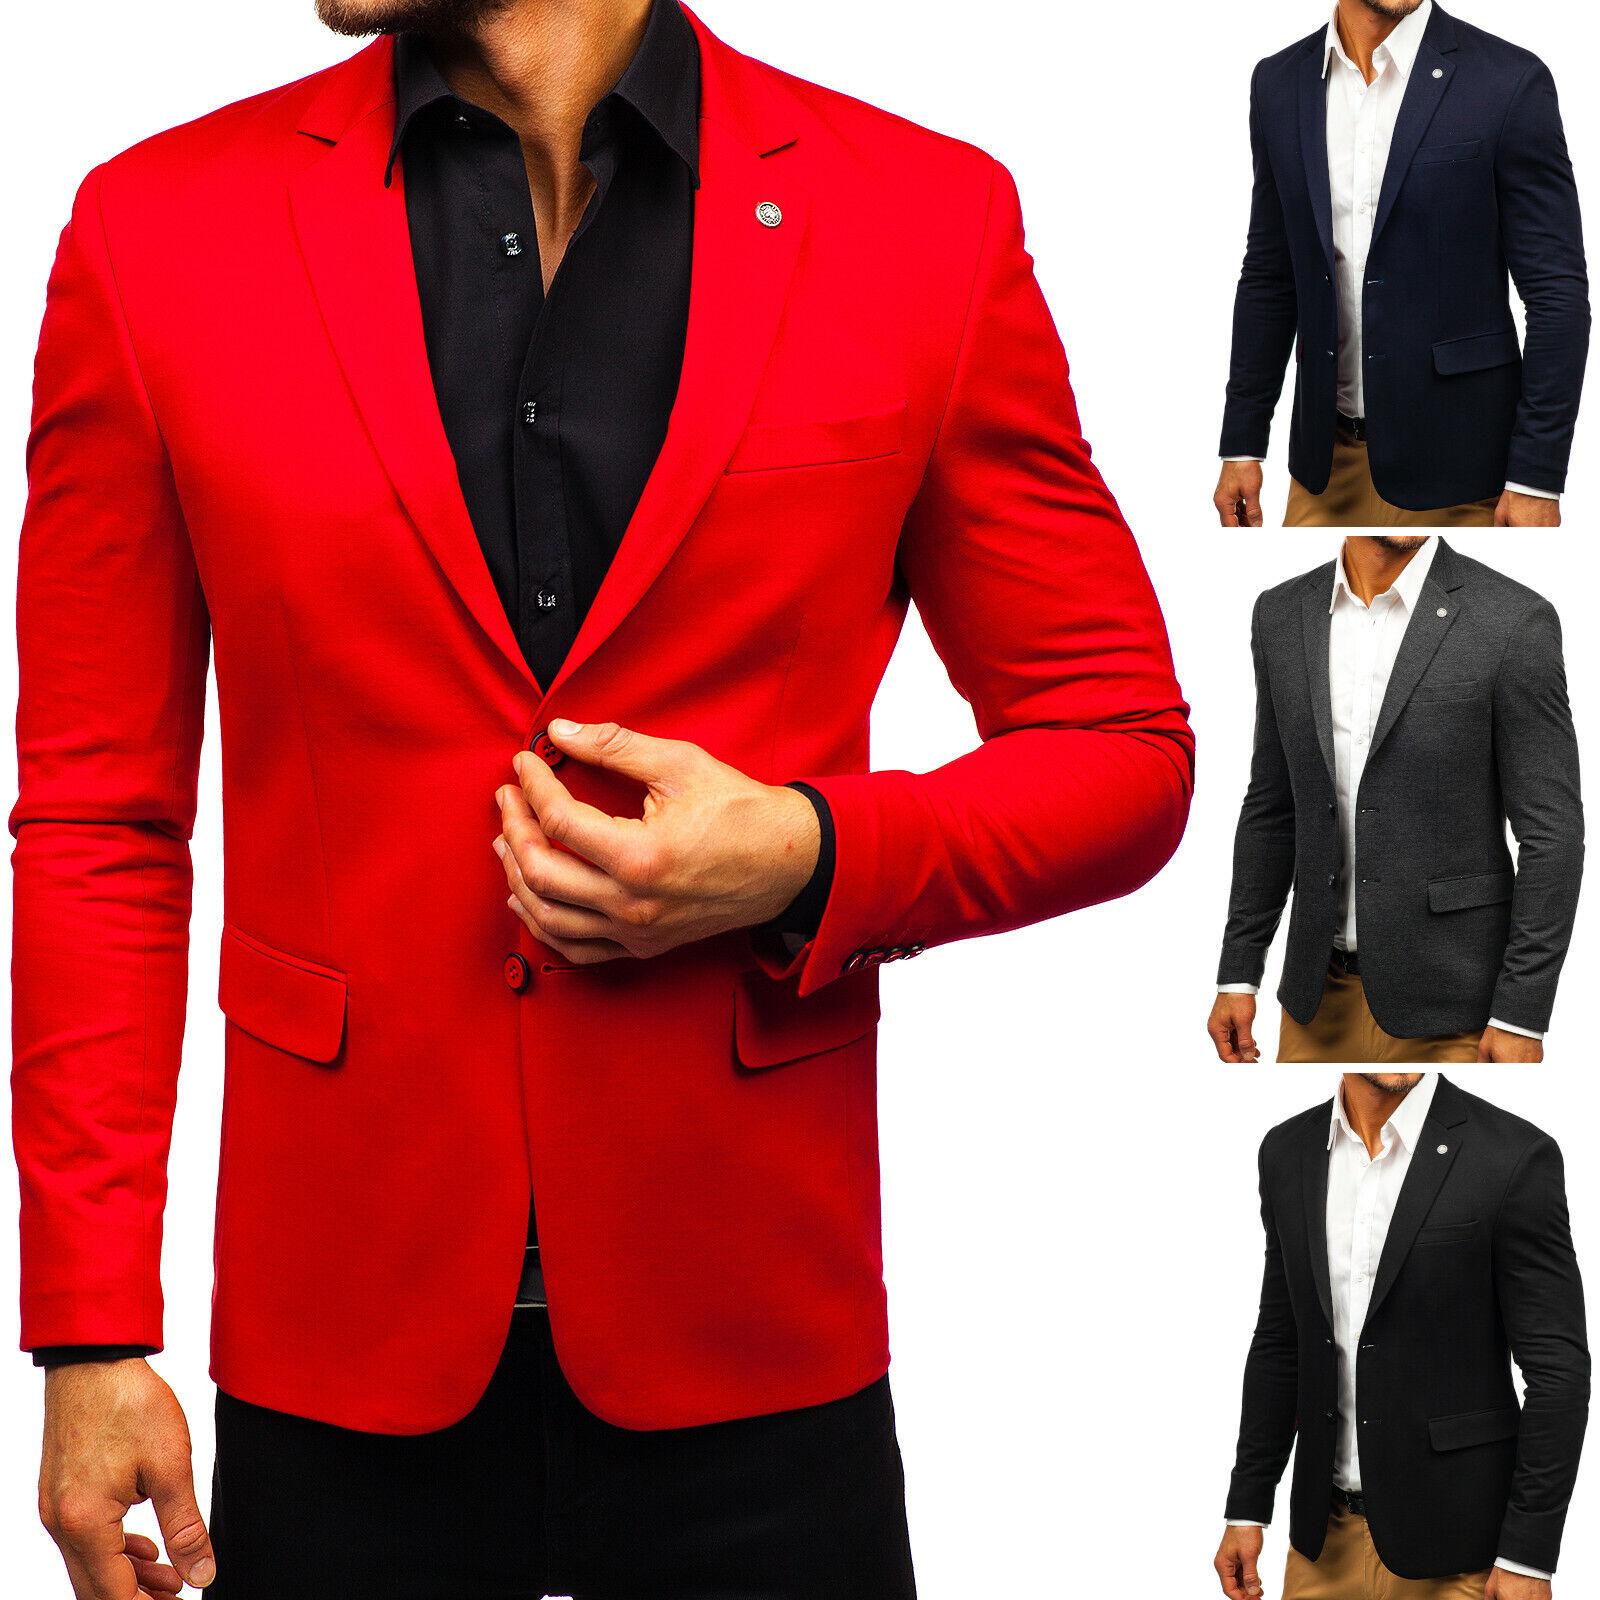 Sakko Jacke Anzug Blazer Sweatjacke Slim Fit Casual Herren Mix BOLF 4D4 Classic